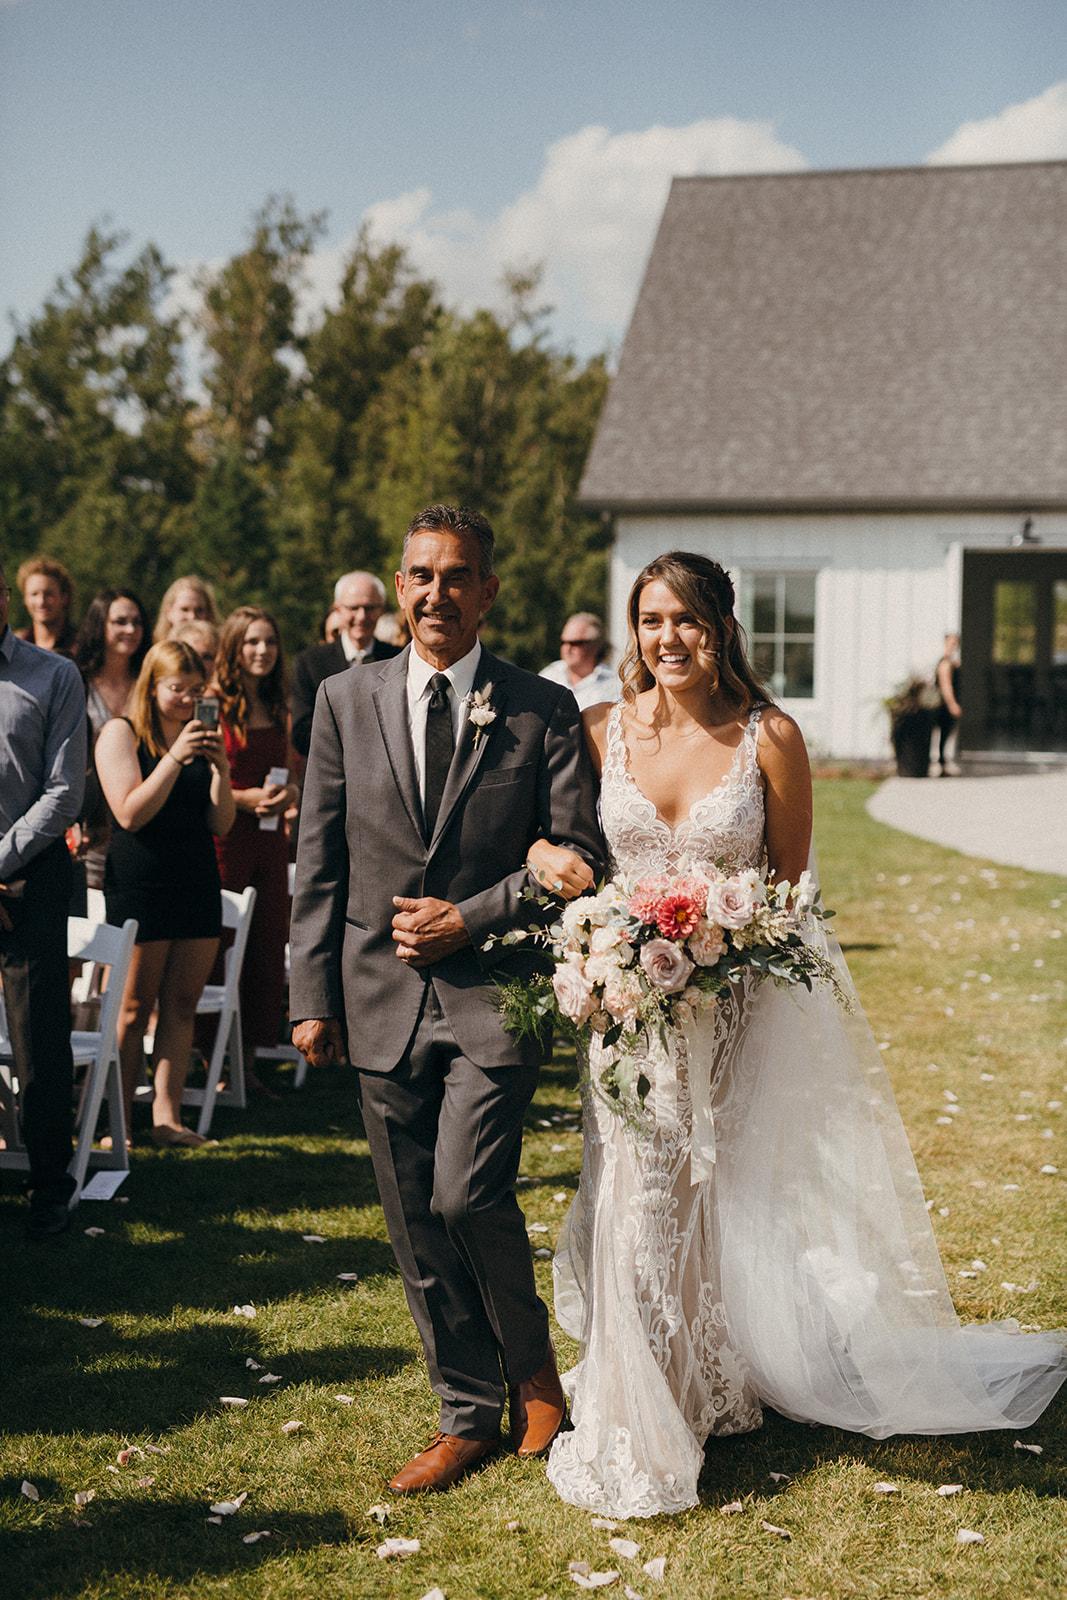 kaden_justine_wedding_1185.jpg